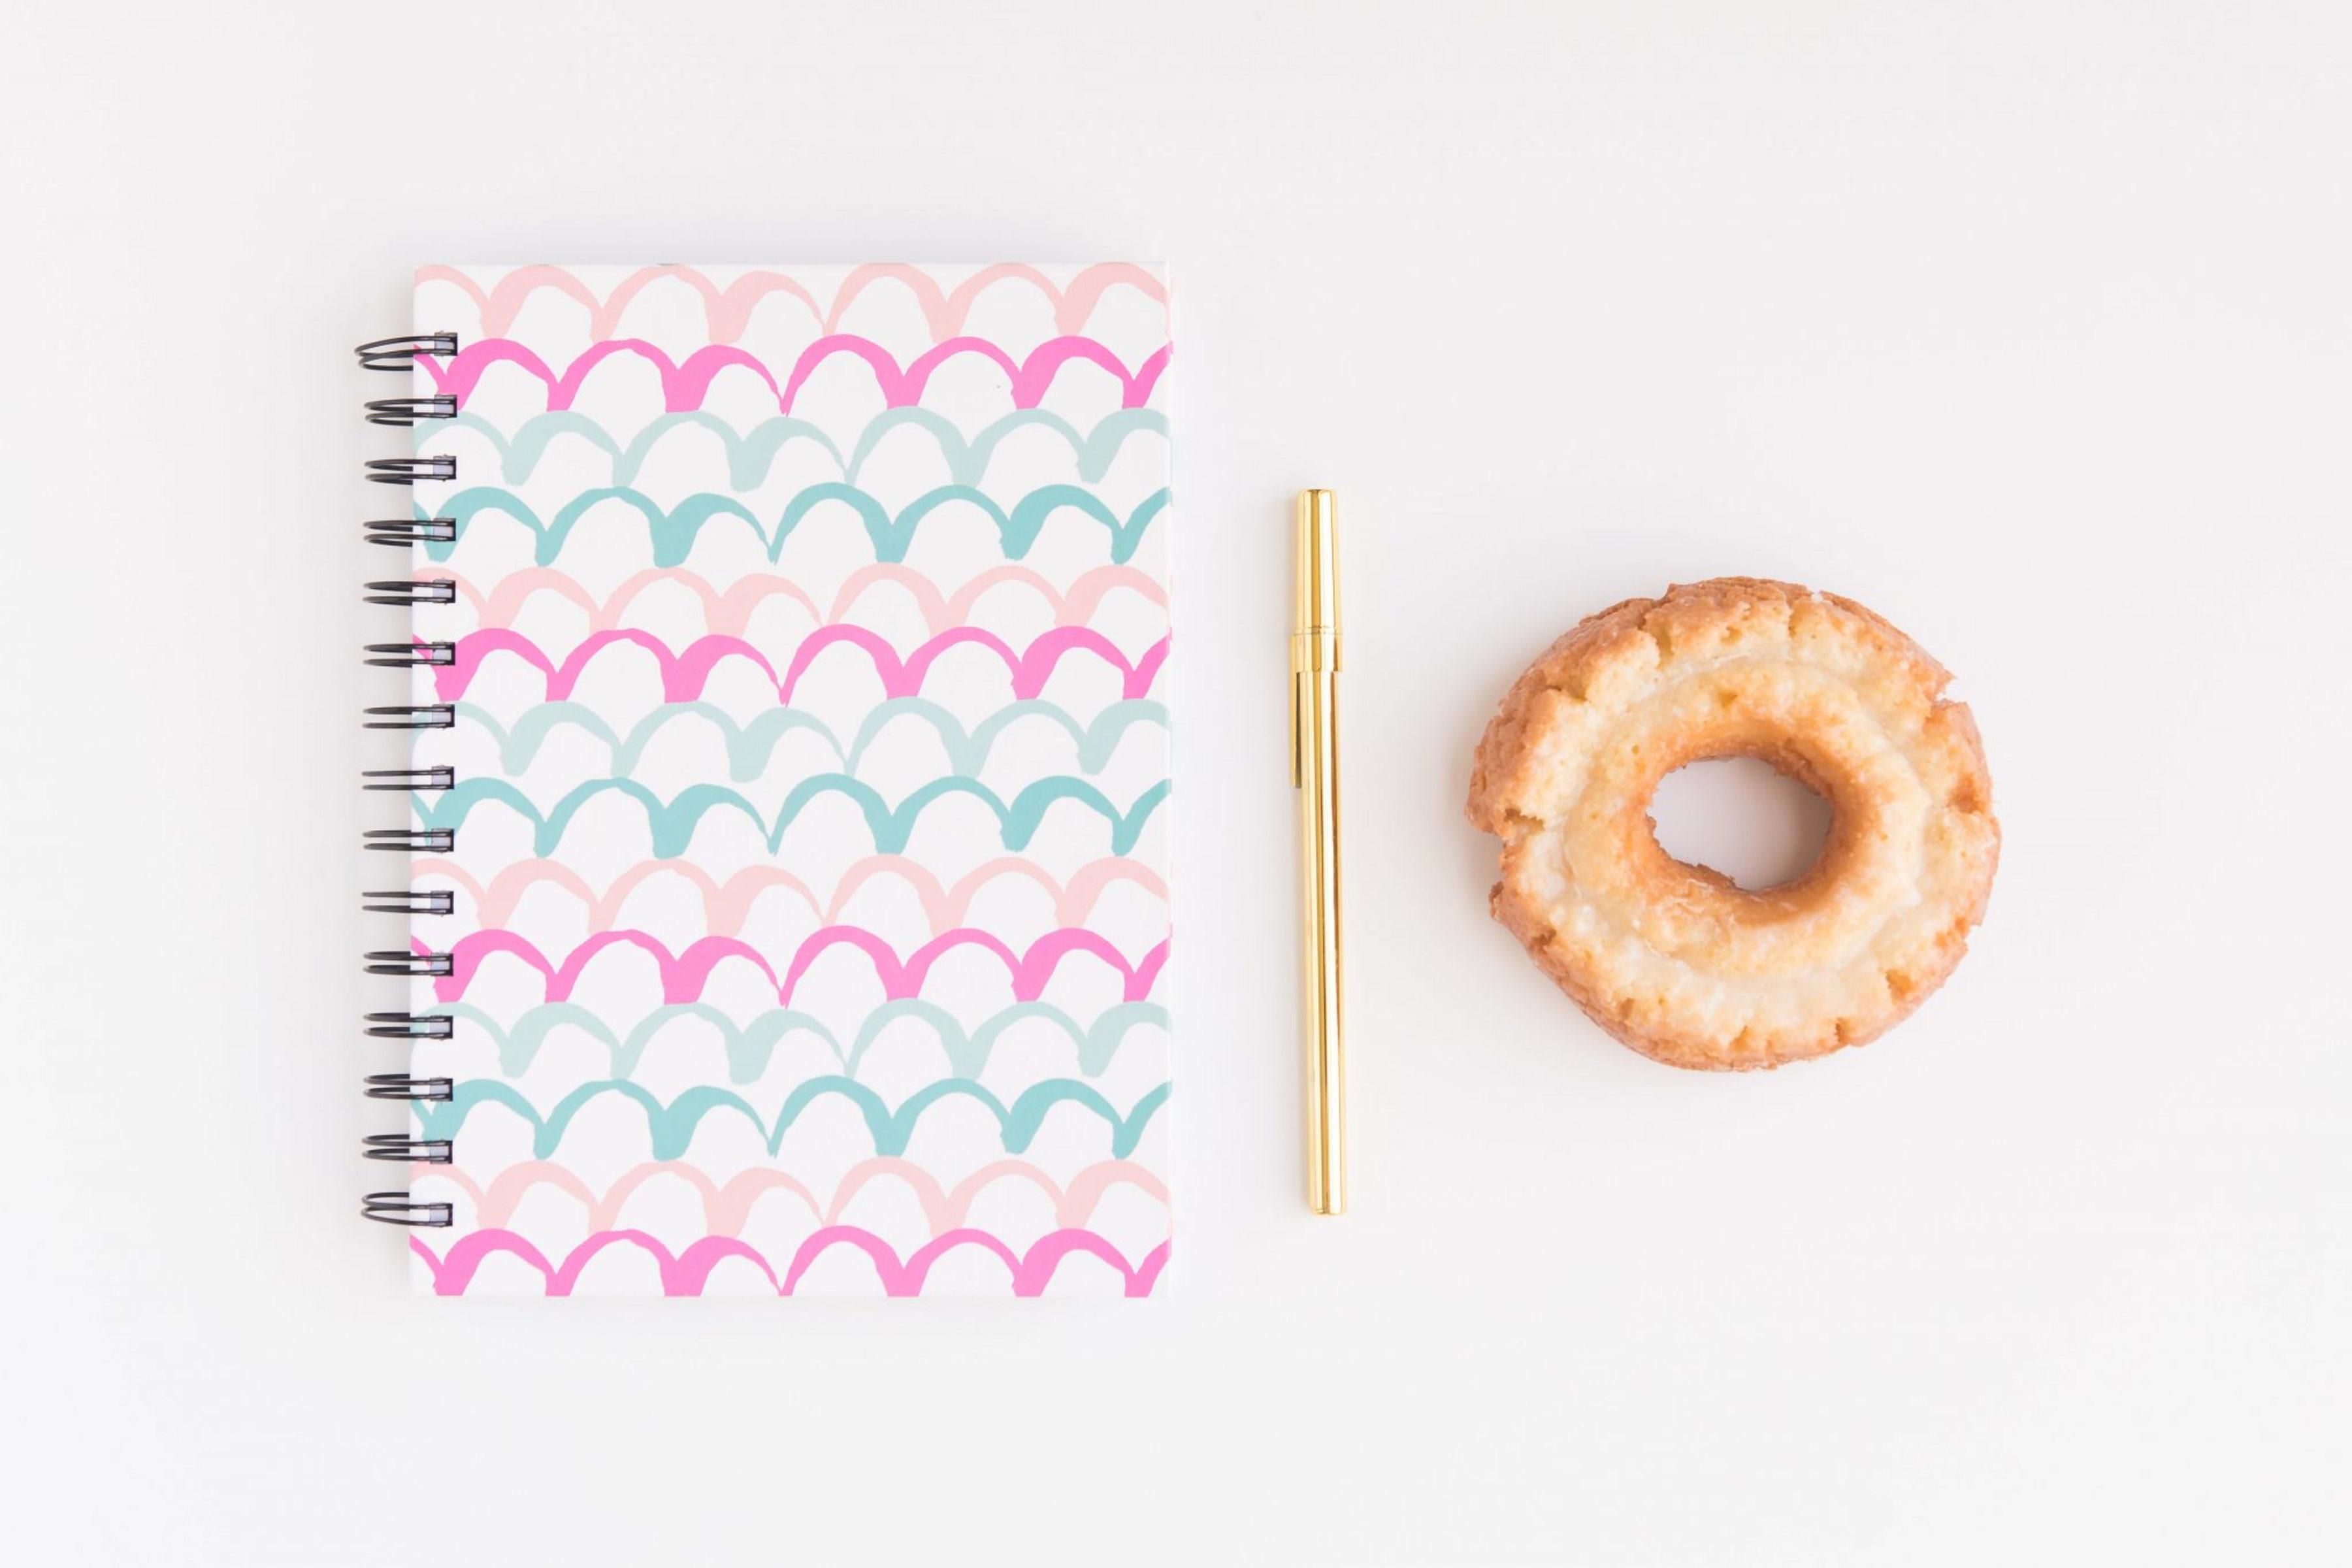 An efficient way to achieve your blogging goals